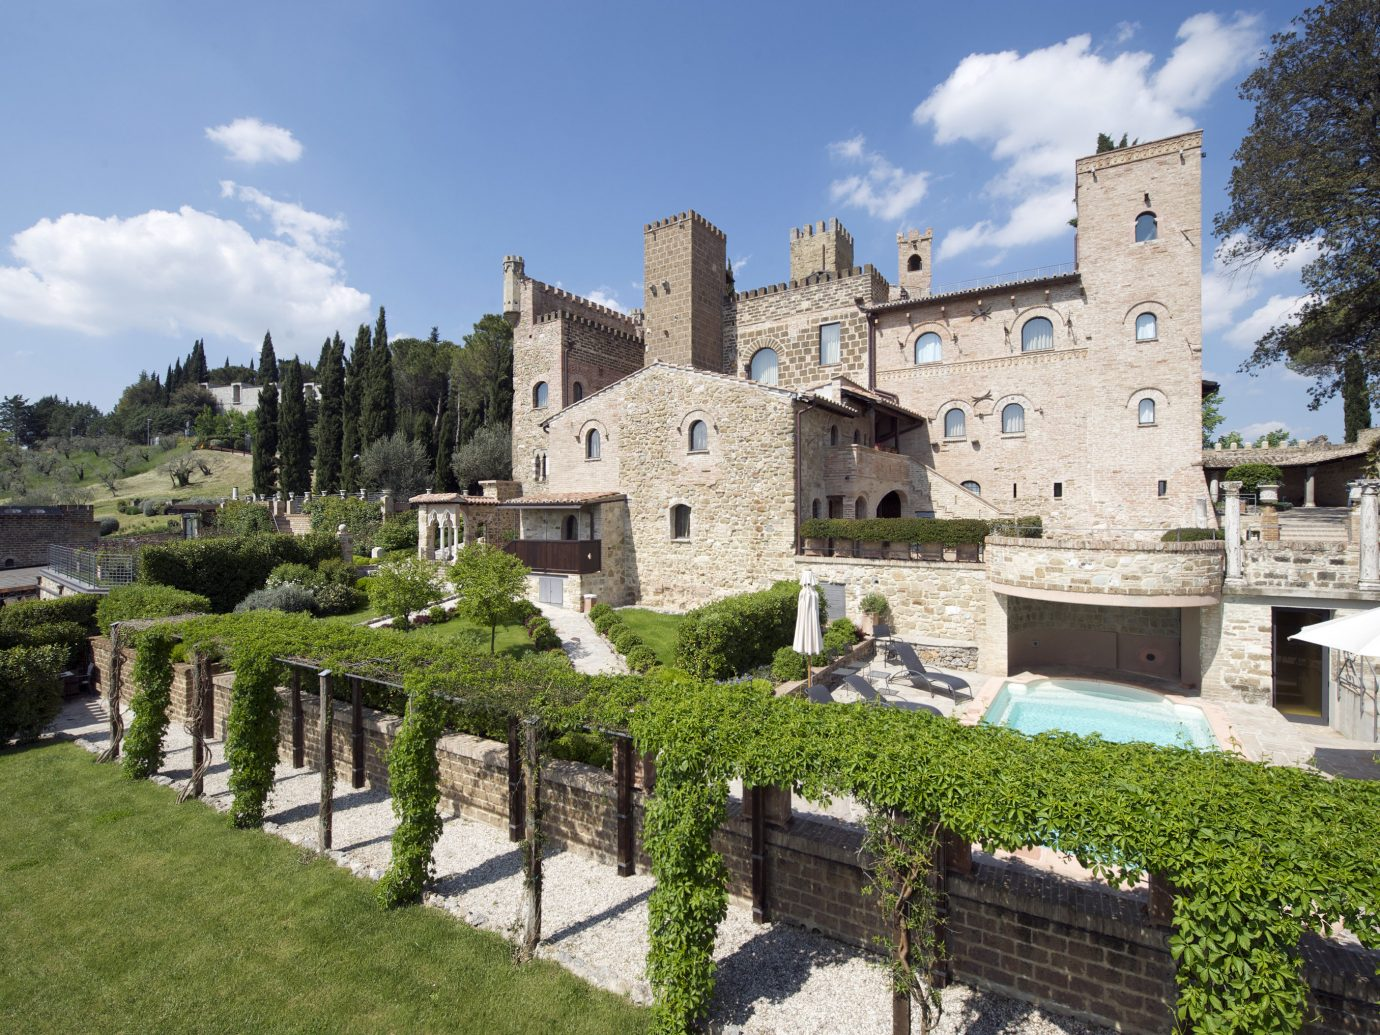 europe Hotels Italy Romance property Village château estate castle building medieval architecture historic site tree Villa sky